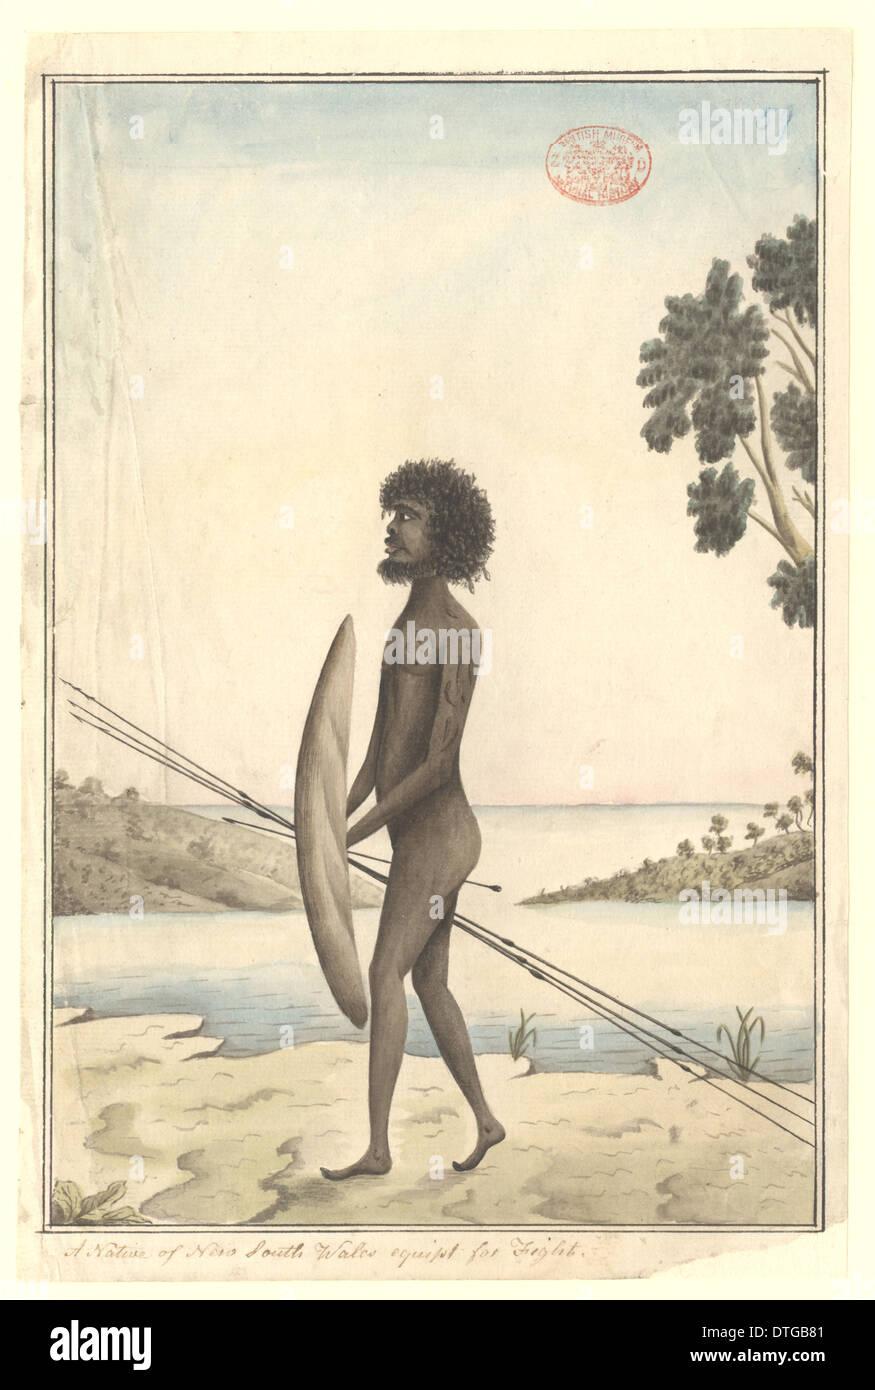 Aboriginal man armed for combat - Stock Image